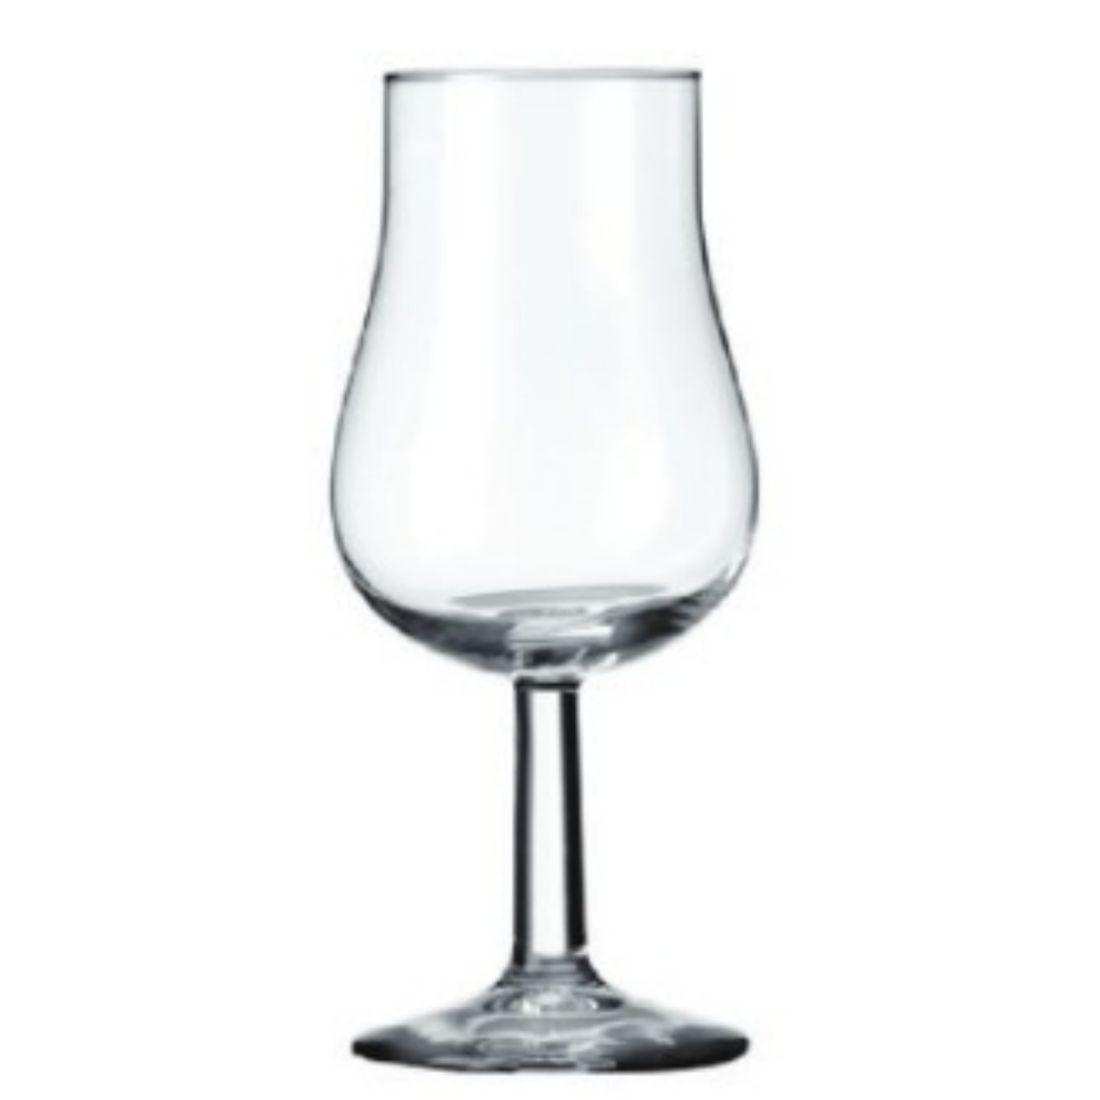 Whiskey sklenička na whisky 13 cl